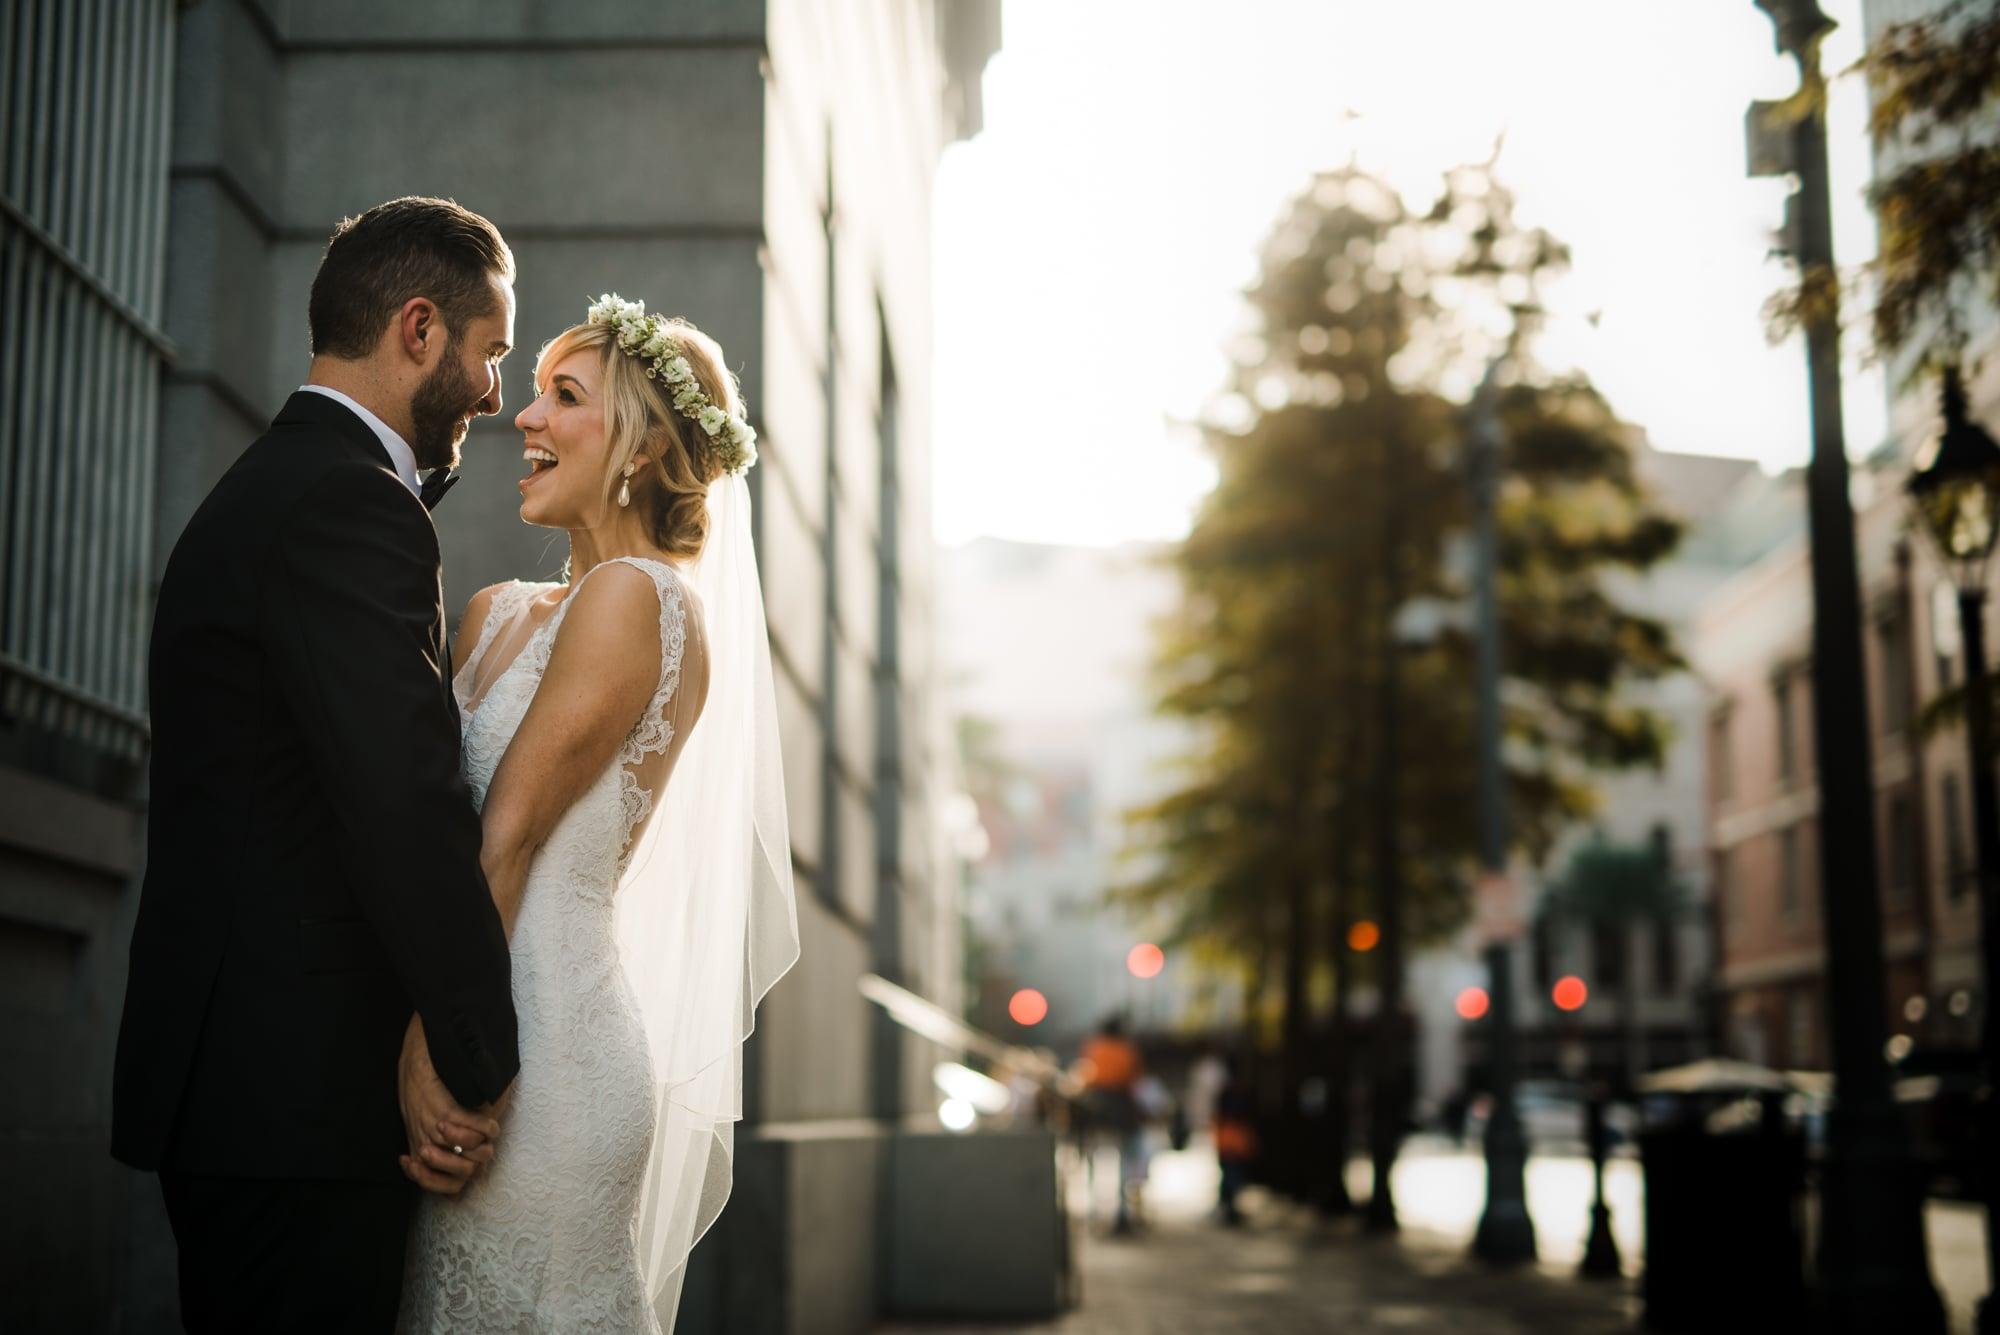 ©Isaiah & Taylor Photography - The Elms Mansion Wedding - New Orleans, Louisiana-23.jpg